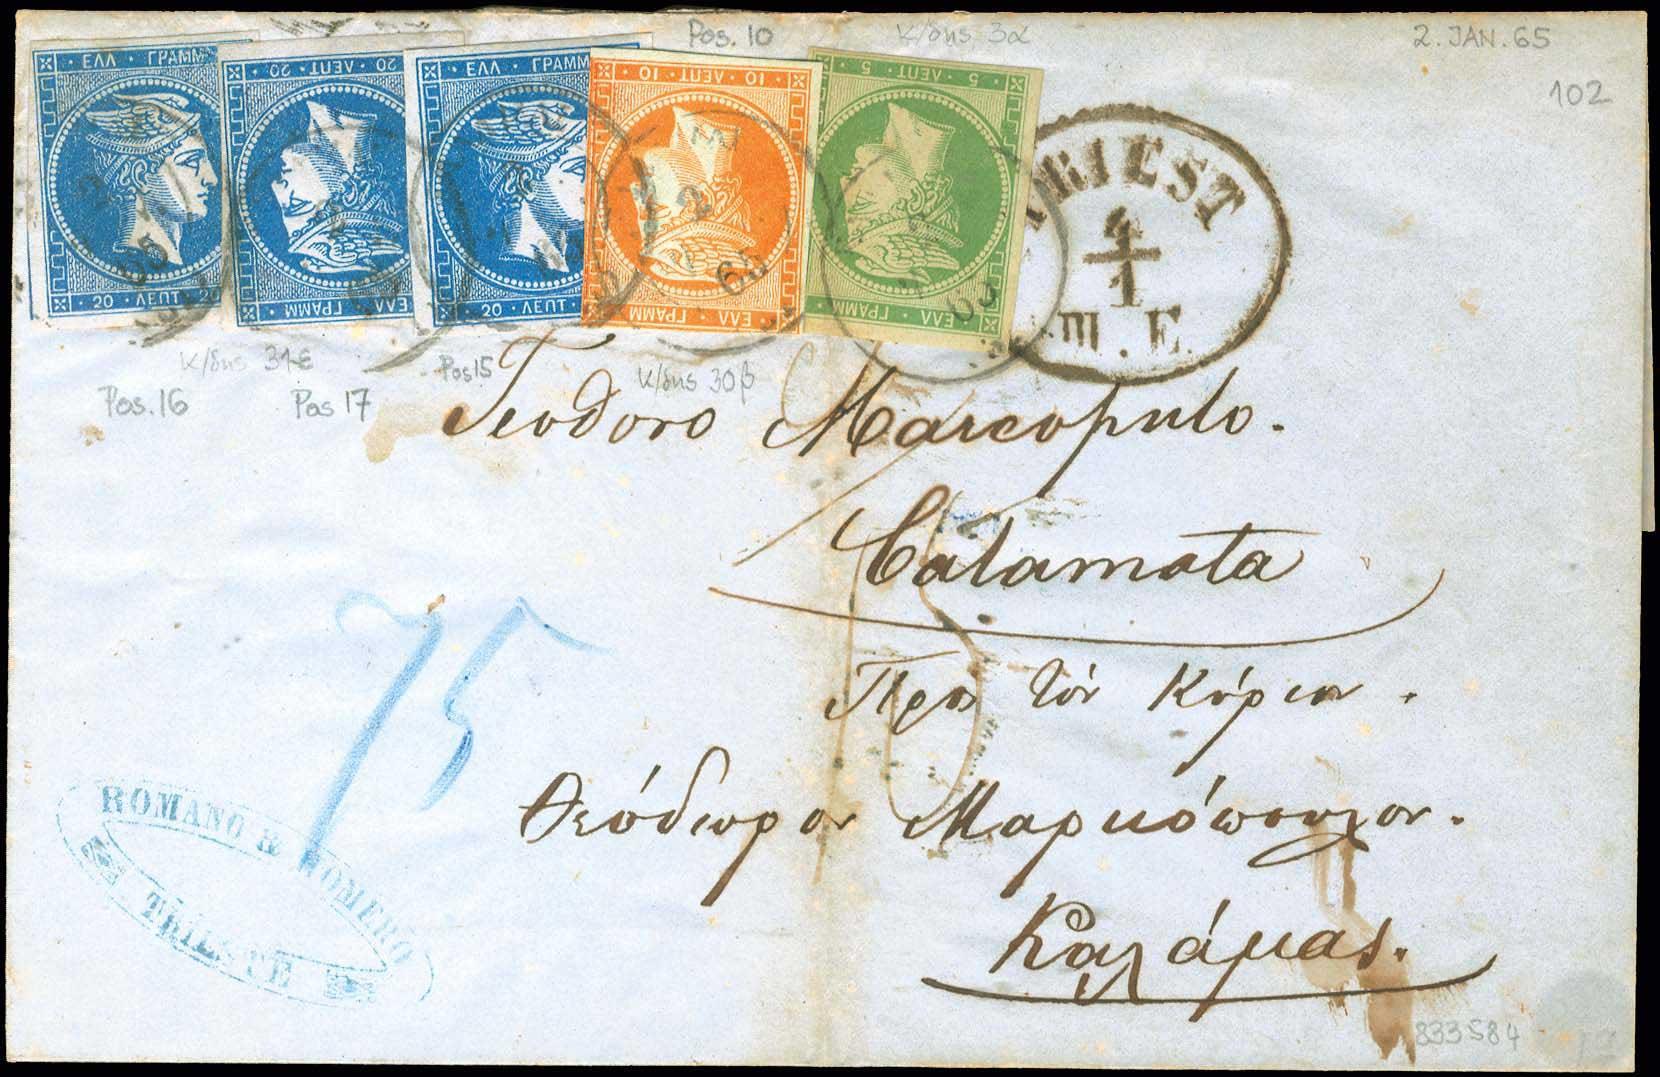 Lot 150 - -  LARGE HERMES HEAD 1862/67 consecutive athens printings -  A. Karamitsos Public & Live Internet Auction 683